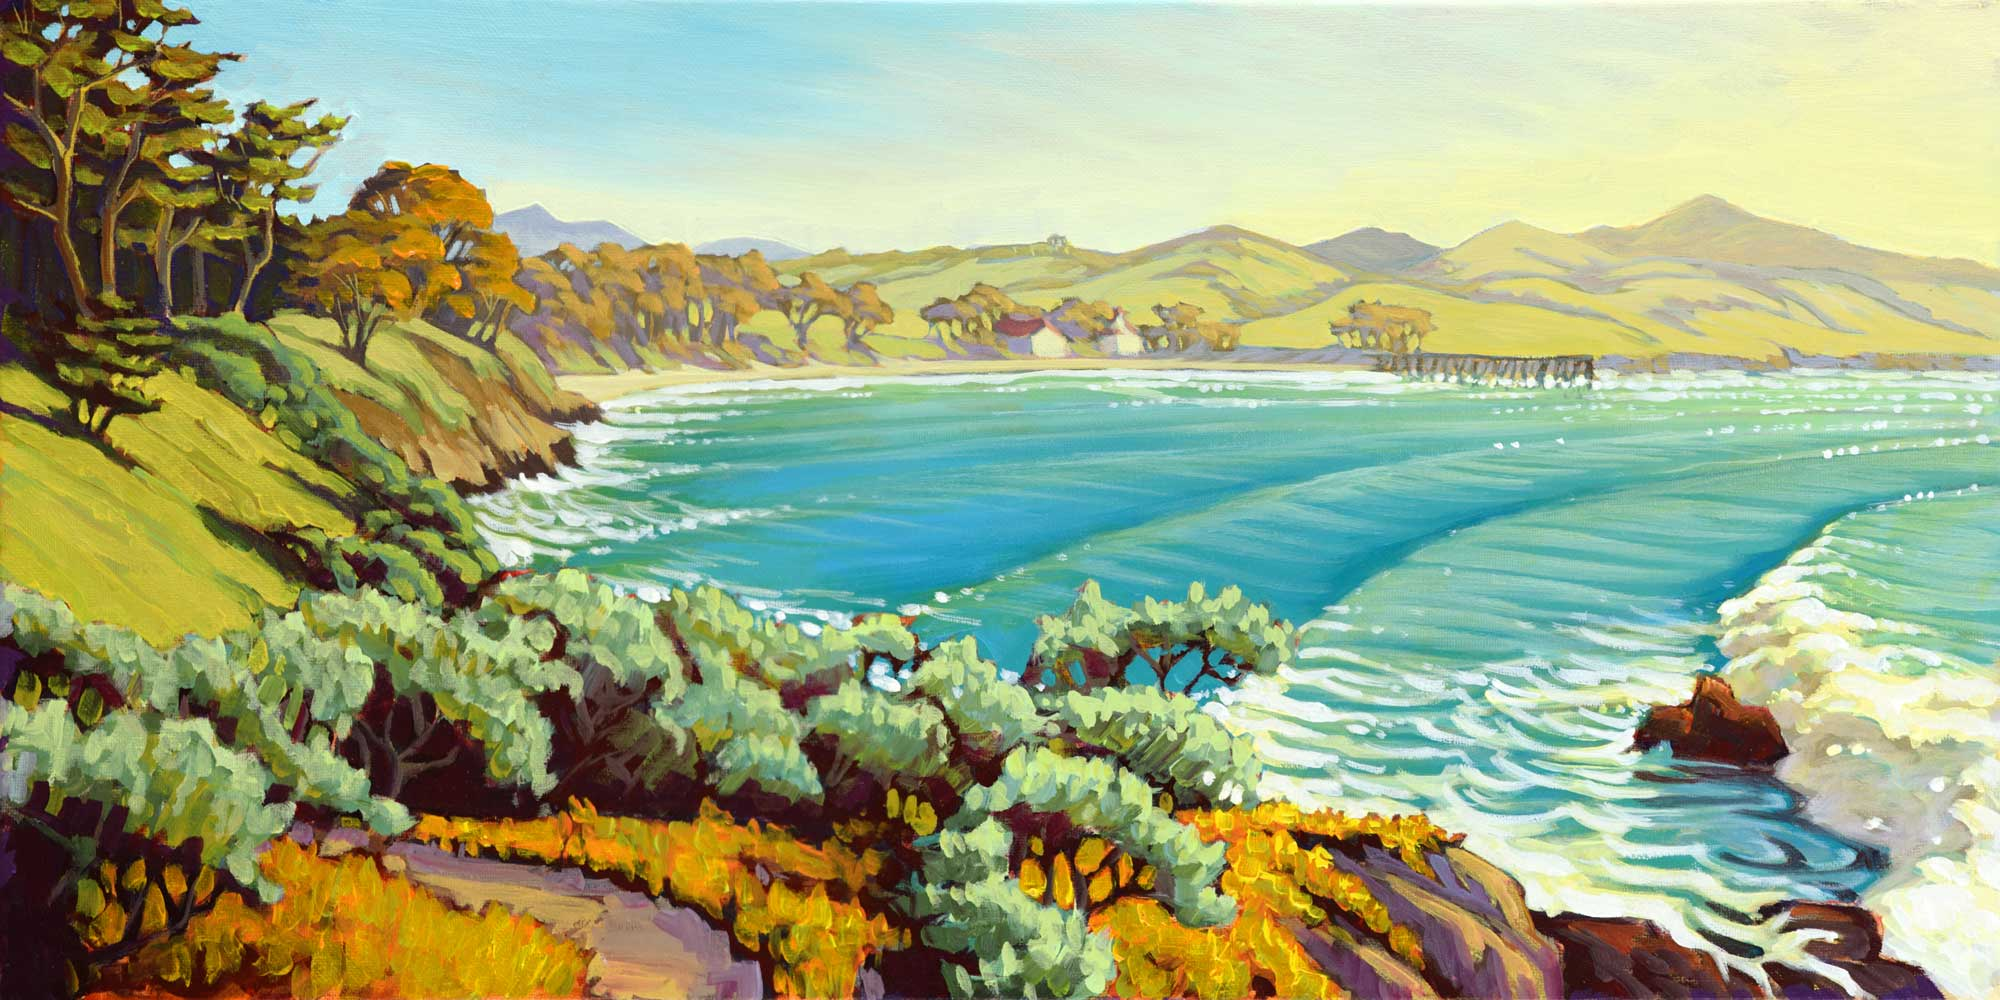 Plein air painting of San Simeon Pier and Cove on the San Luis Obispo coast of central California